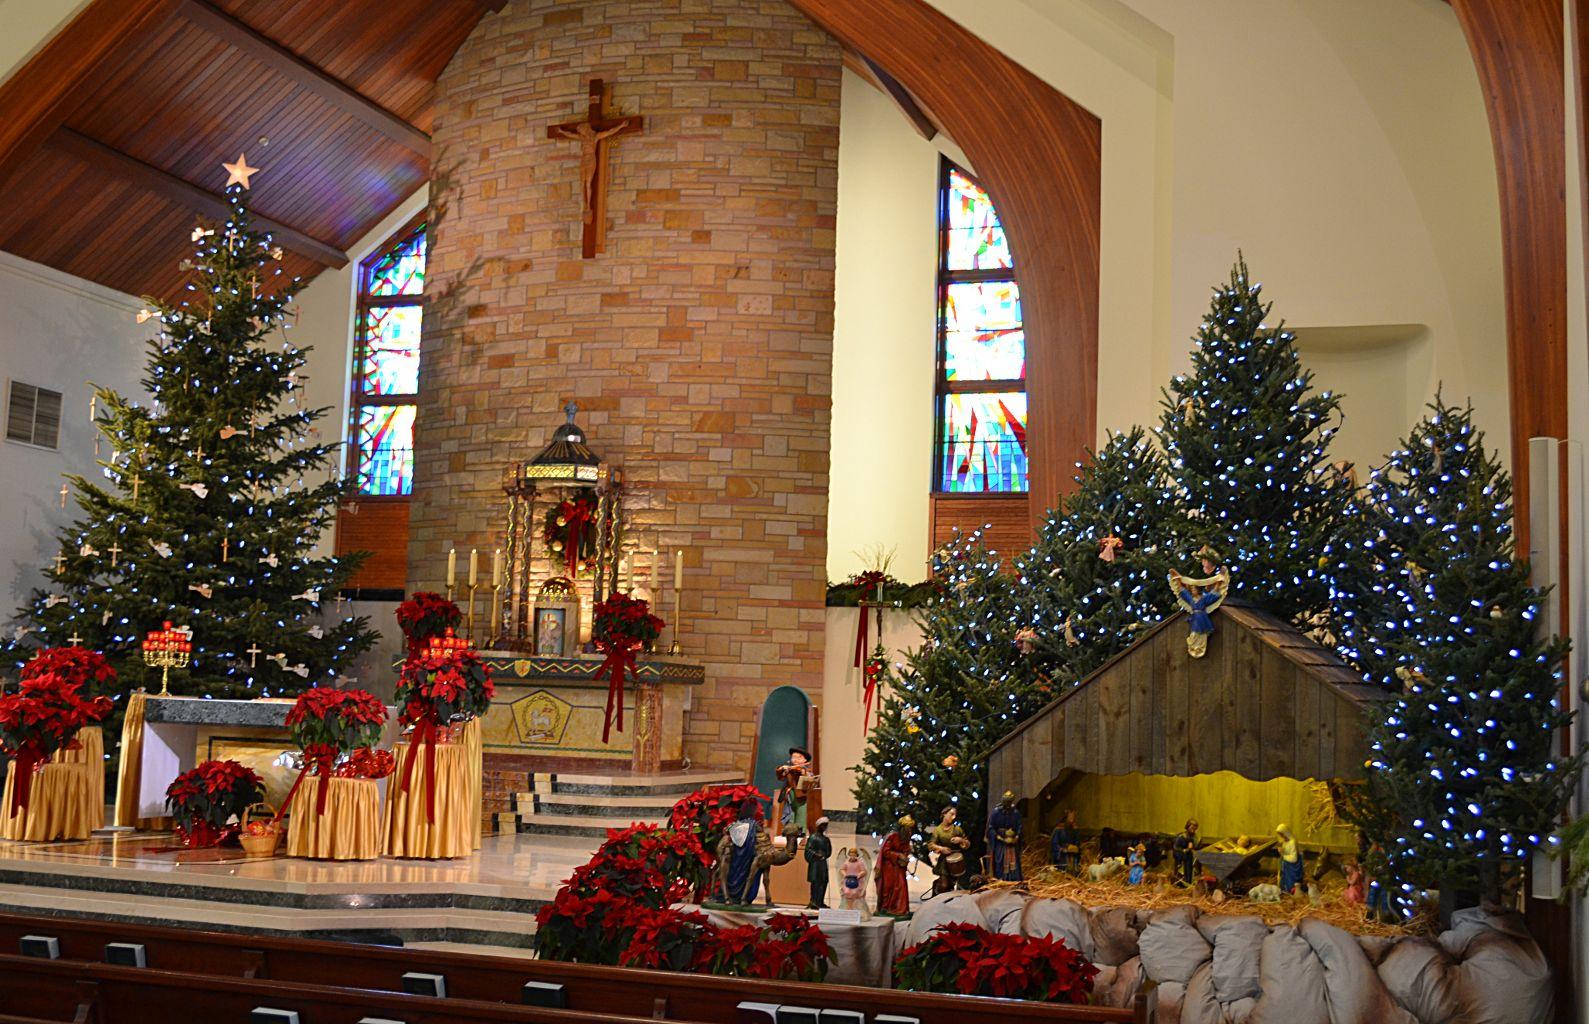 Photographs Our Lady Of Lourdes Church